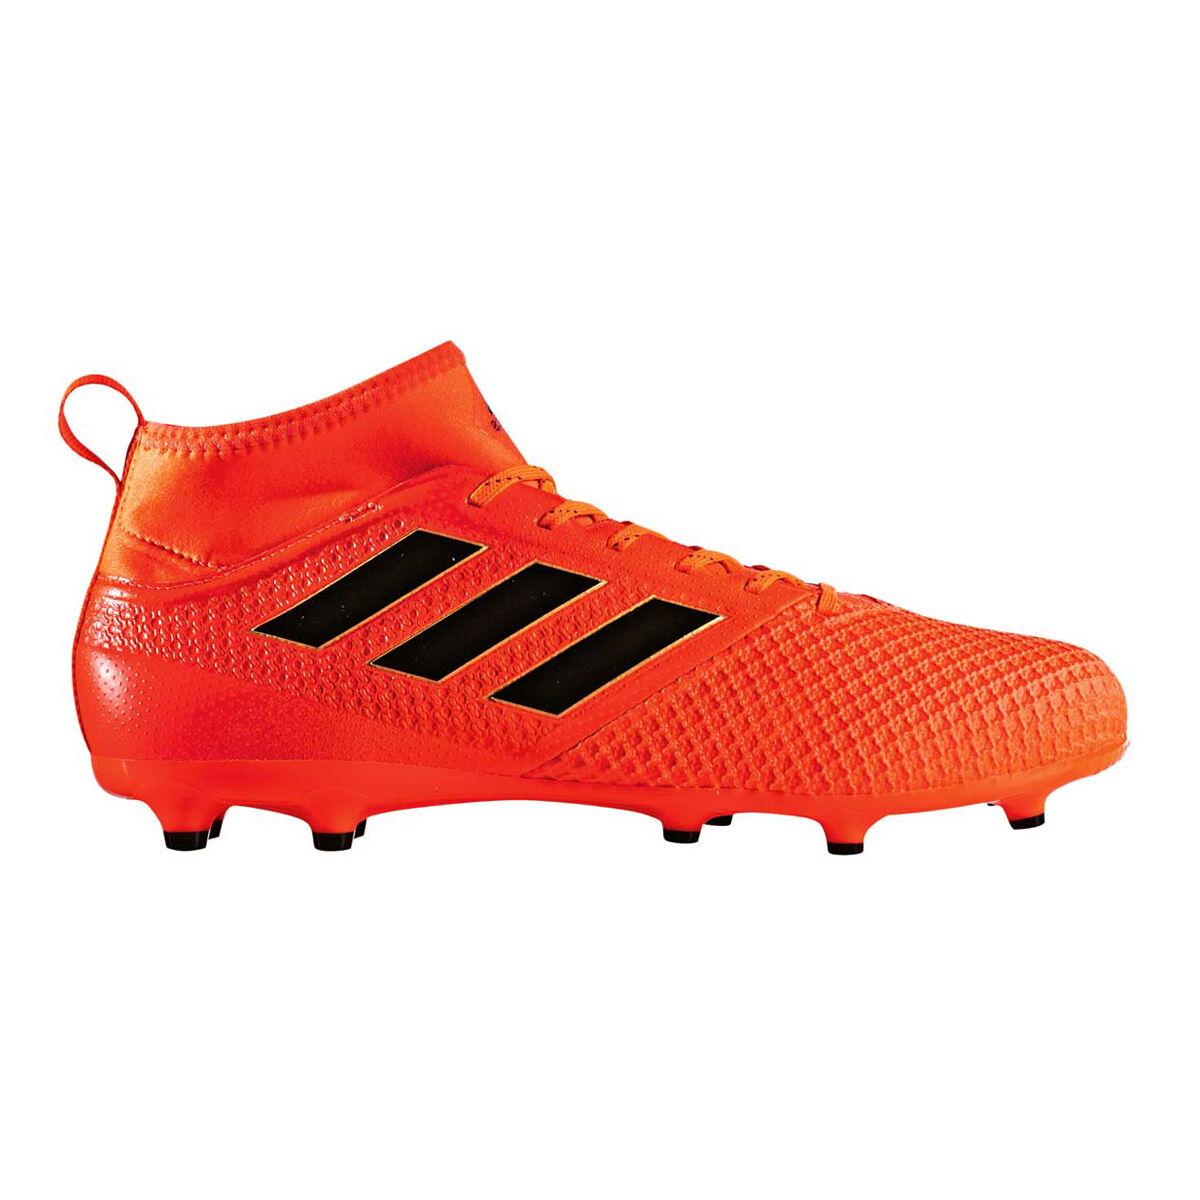 adidas ACE 17.3 Mens Football Boots